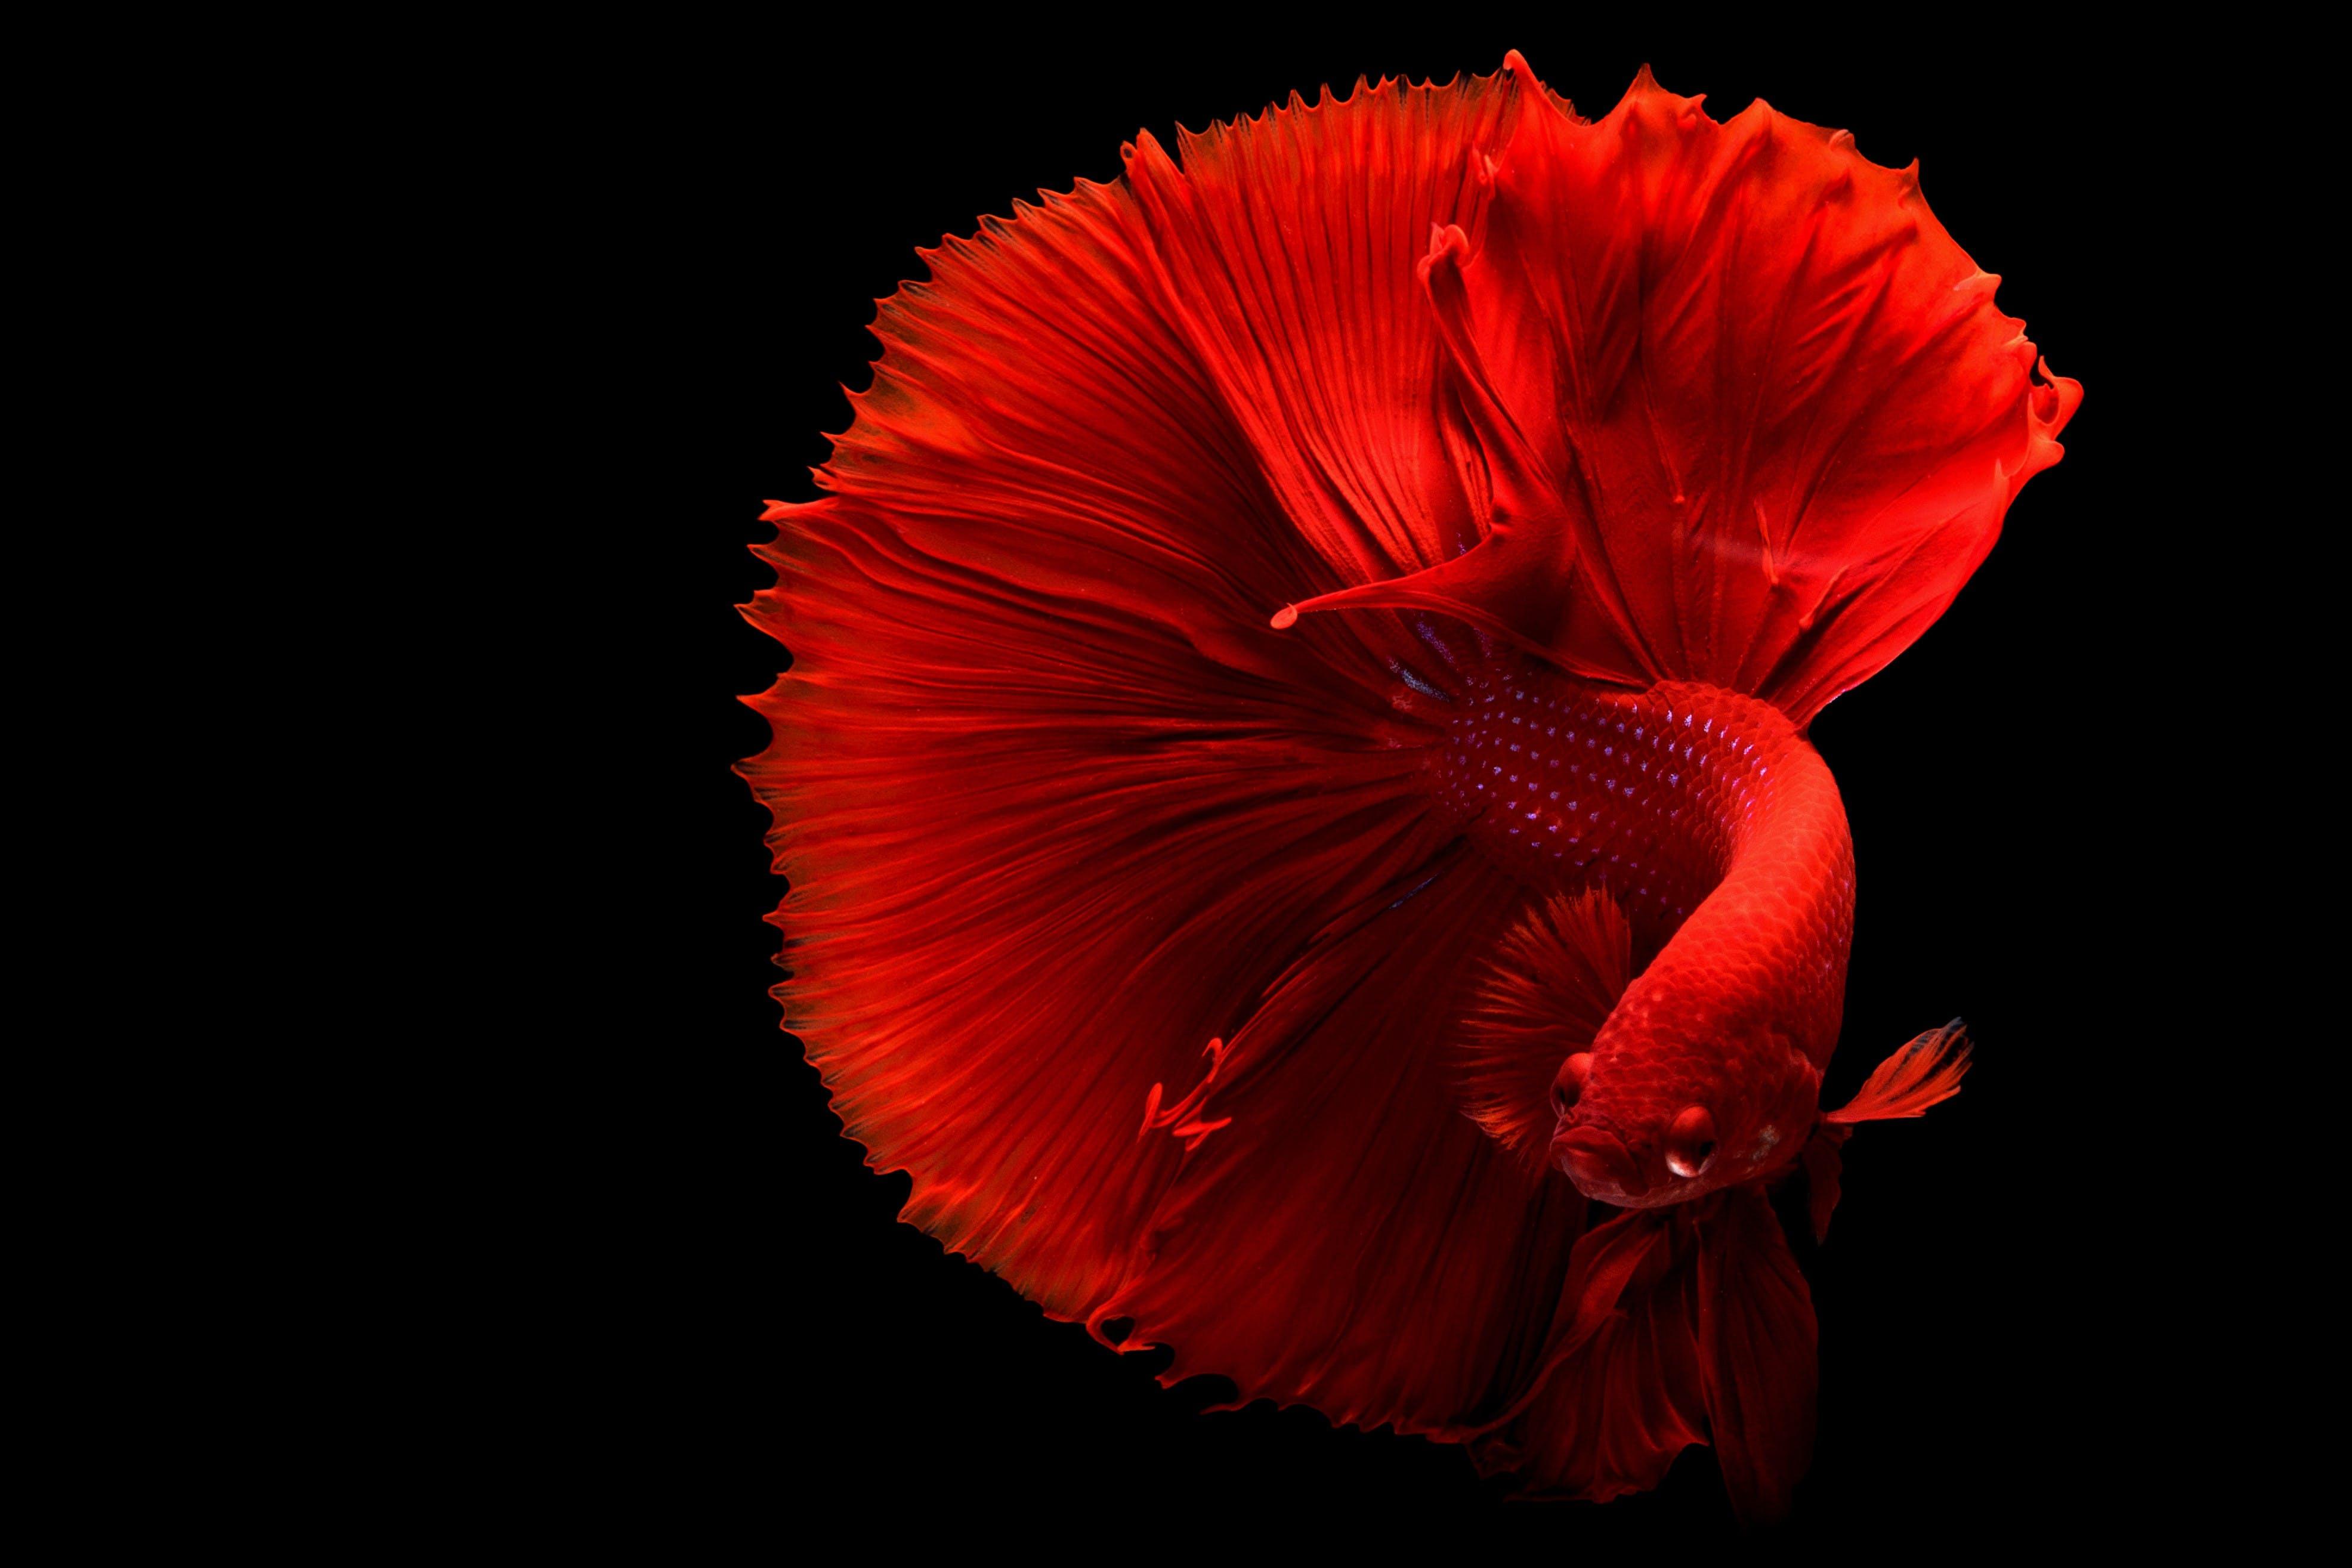 Red Betta Fish